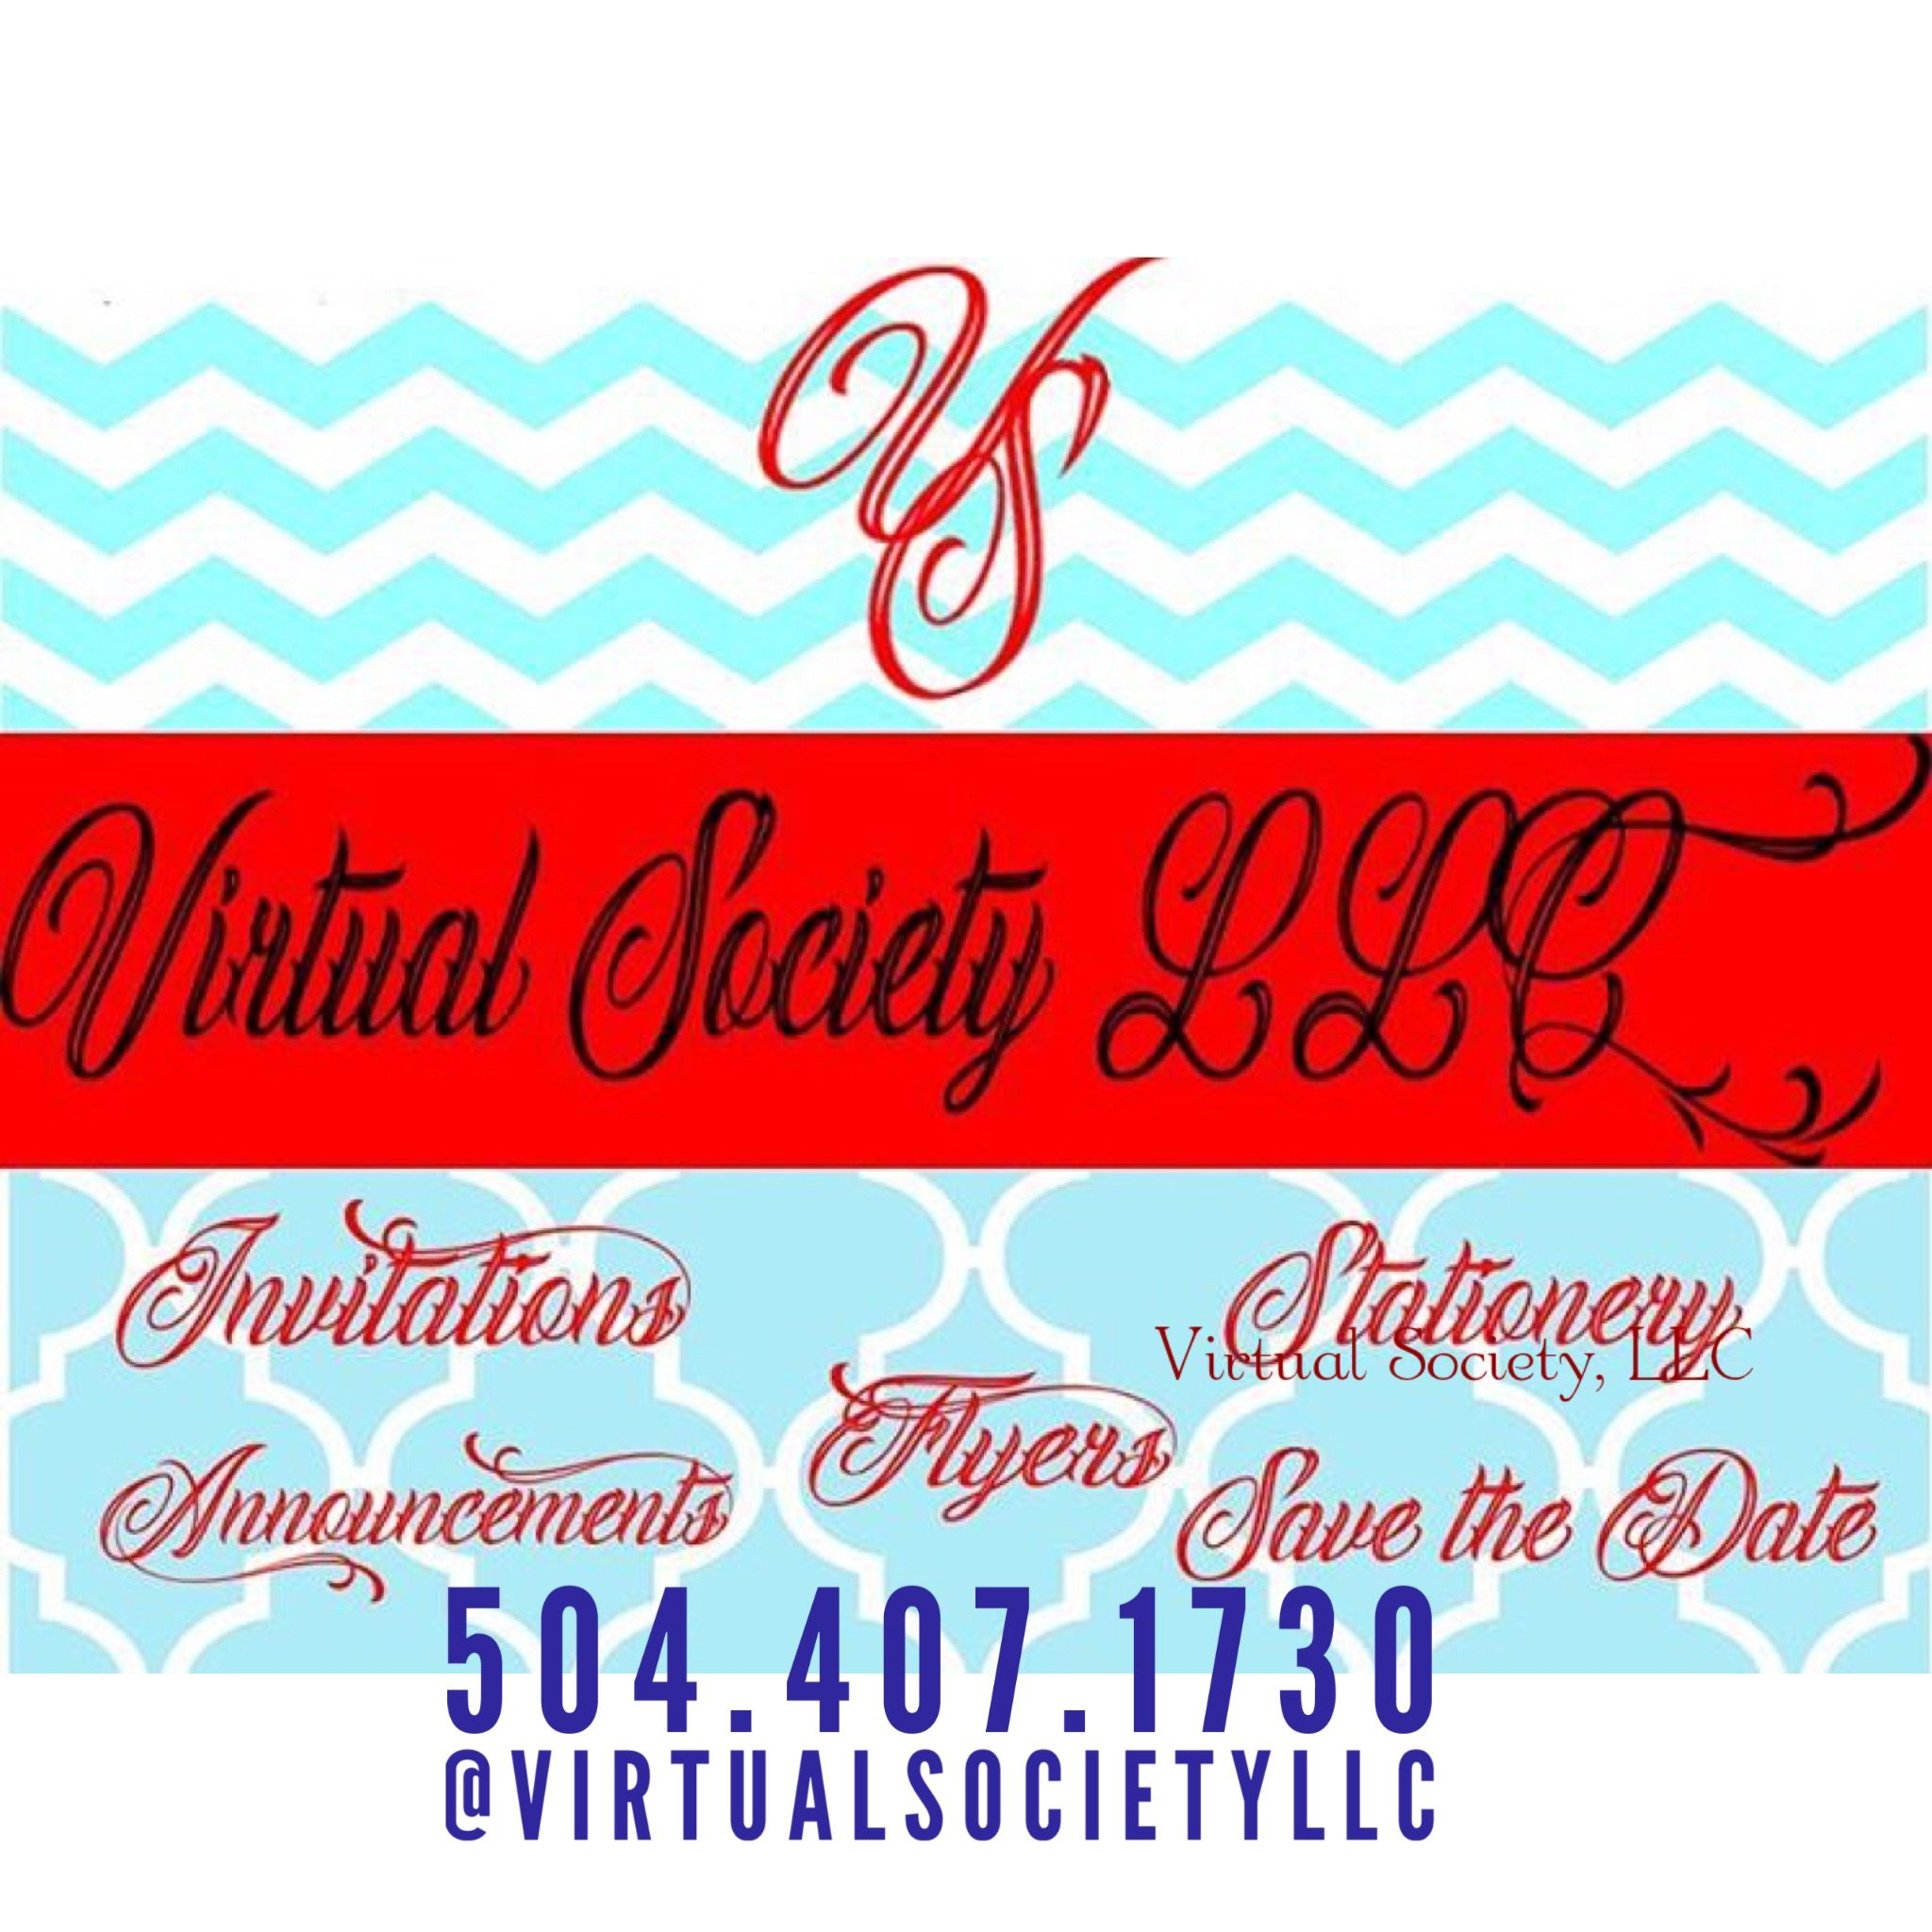 Virtual Society - Custom & Pre-Made Invitations, Save the Date Cards ...